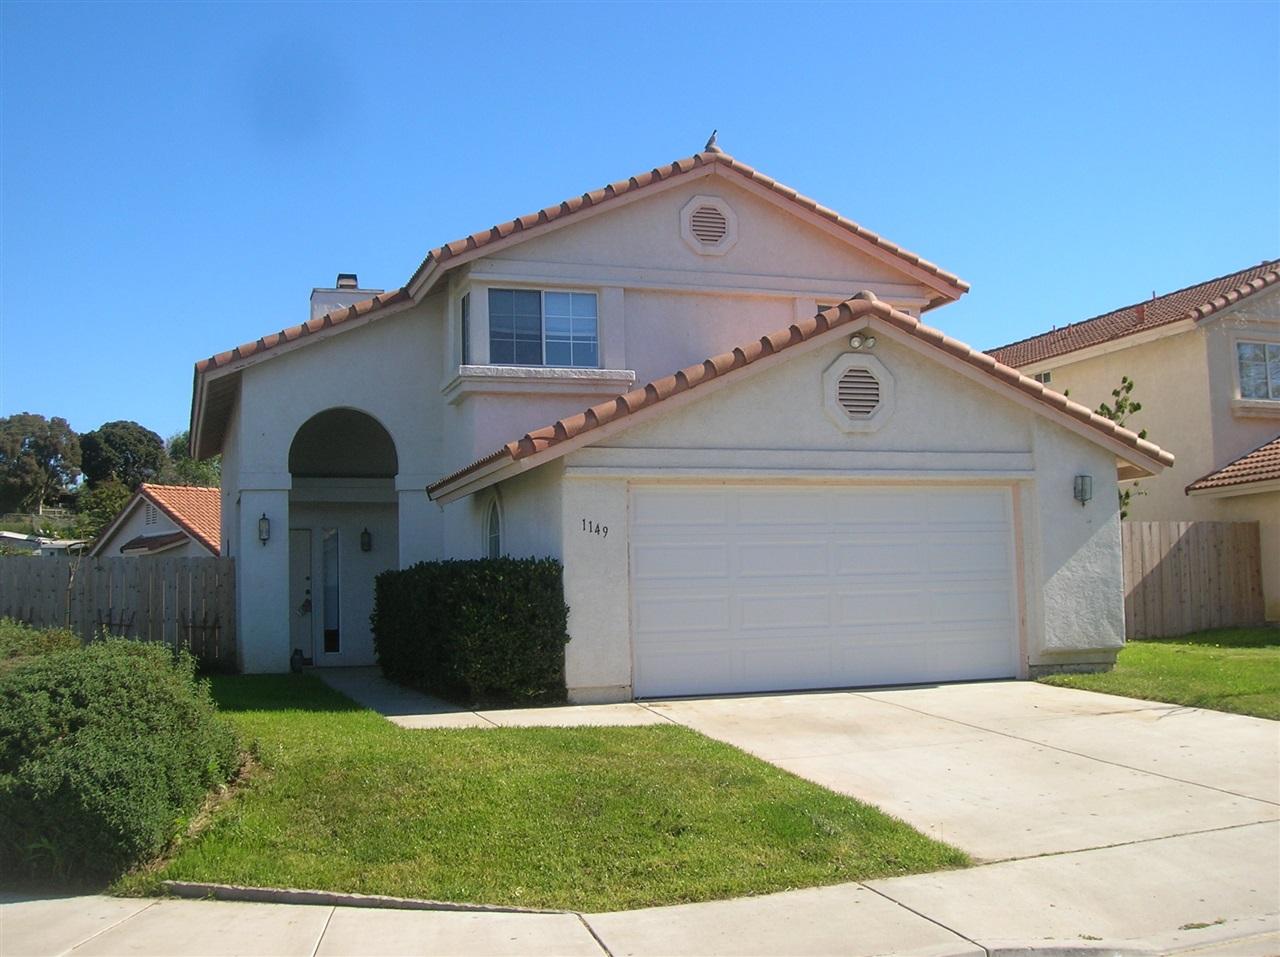 1149 Cochise Ct, Vista, CA